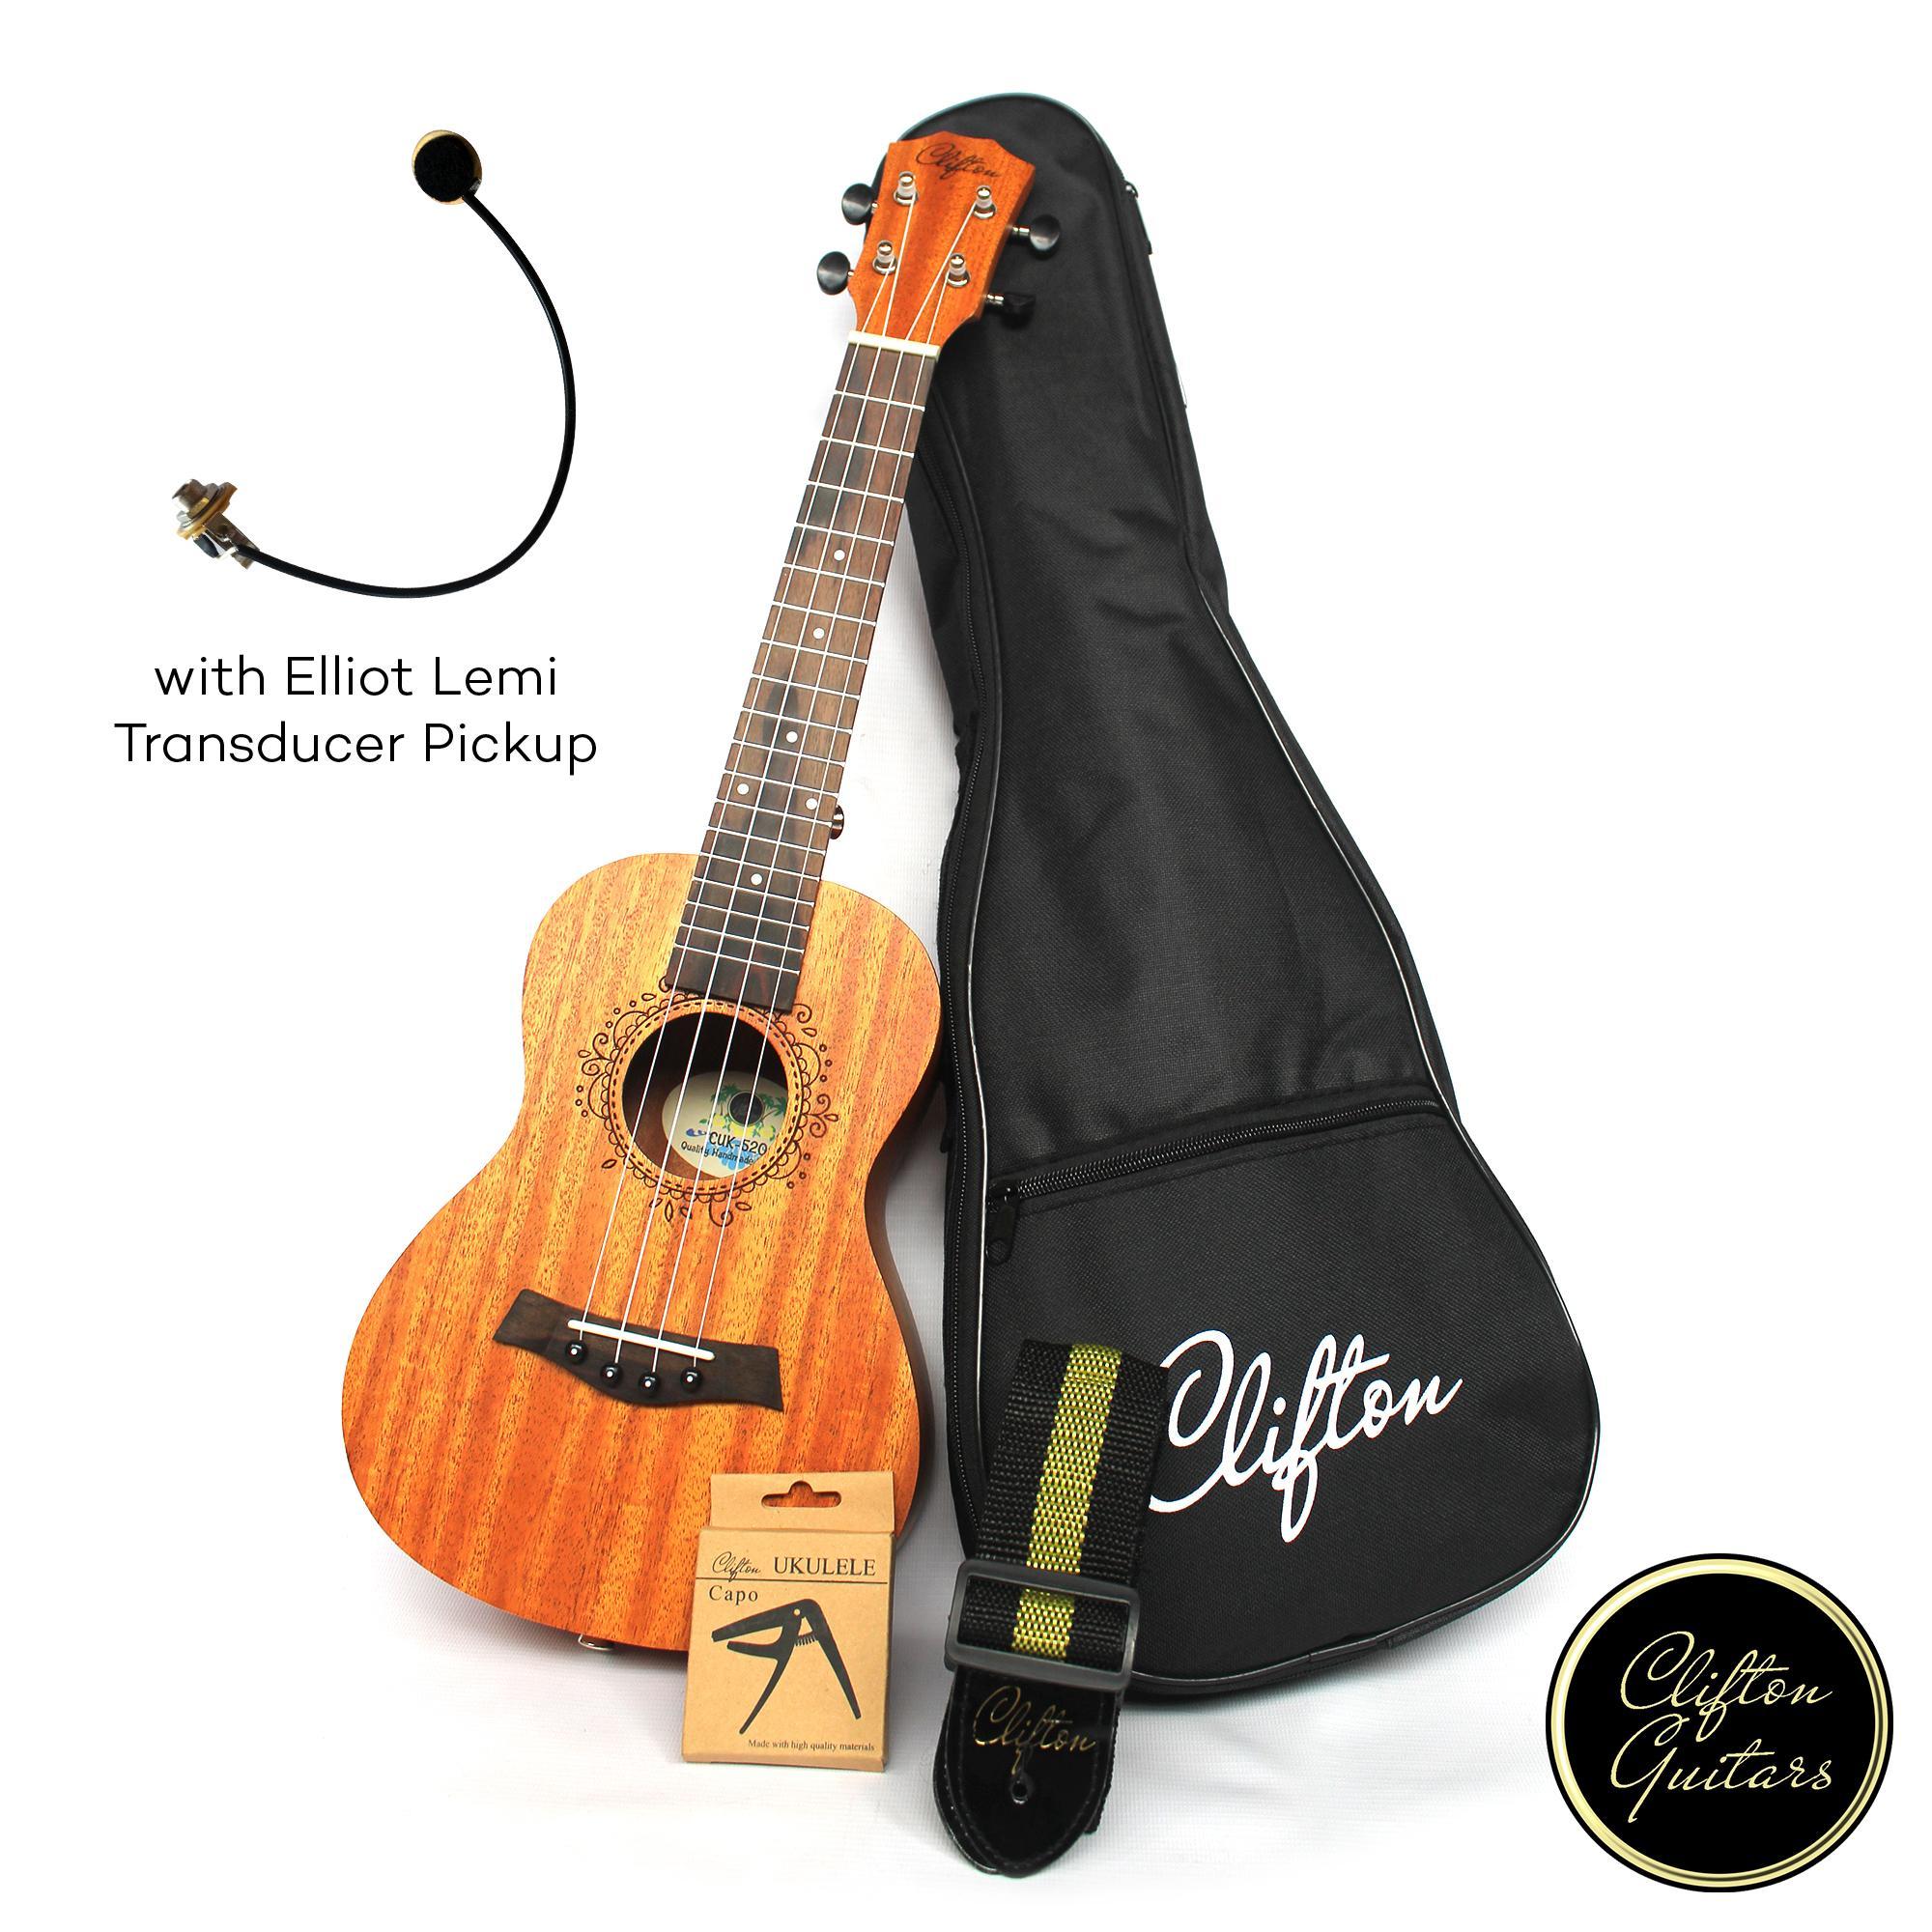 f5590b80c3 Clifton CUK-520e Concert Ukulele w  Elliot Lemi and FREE Accesory ...